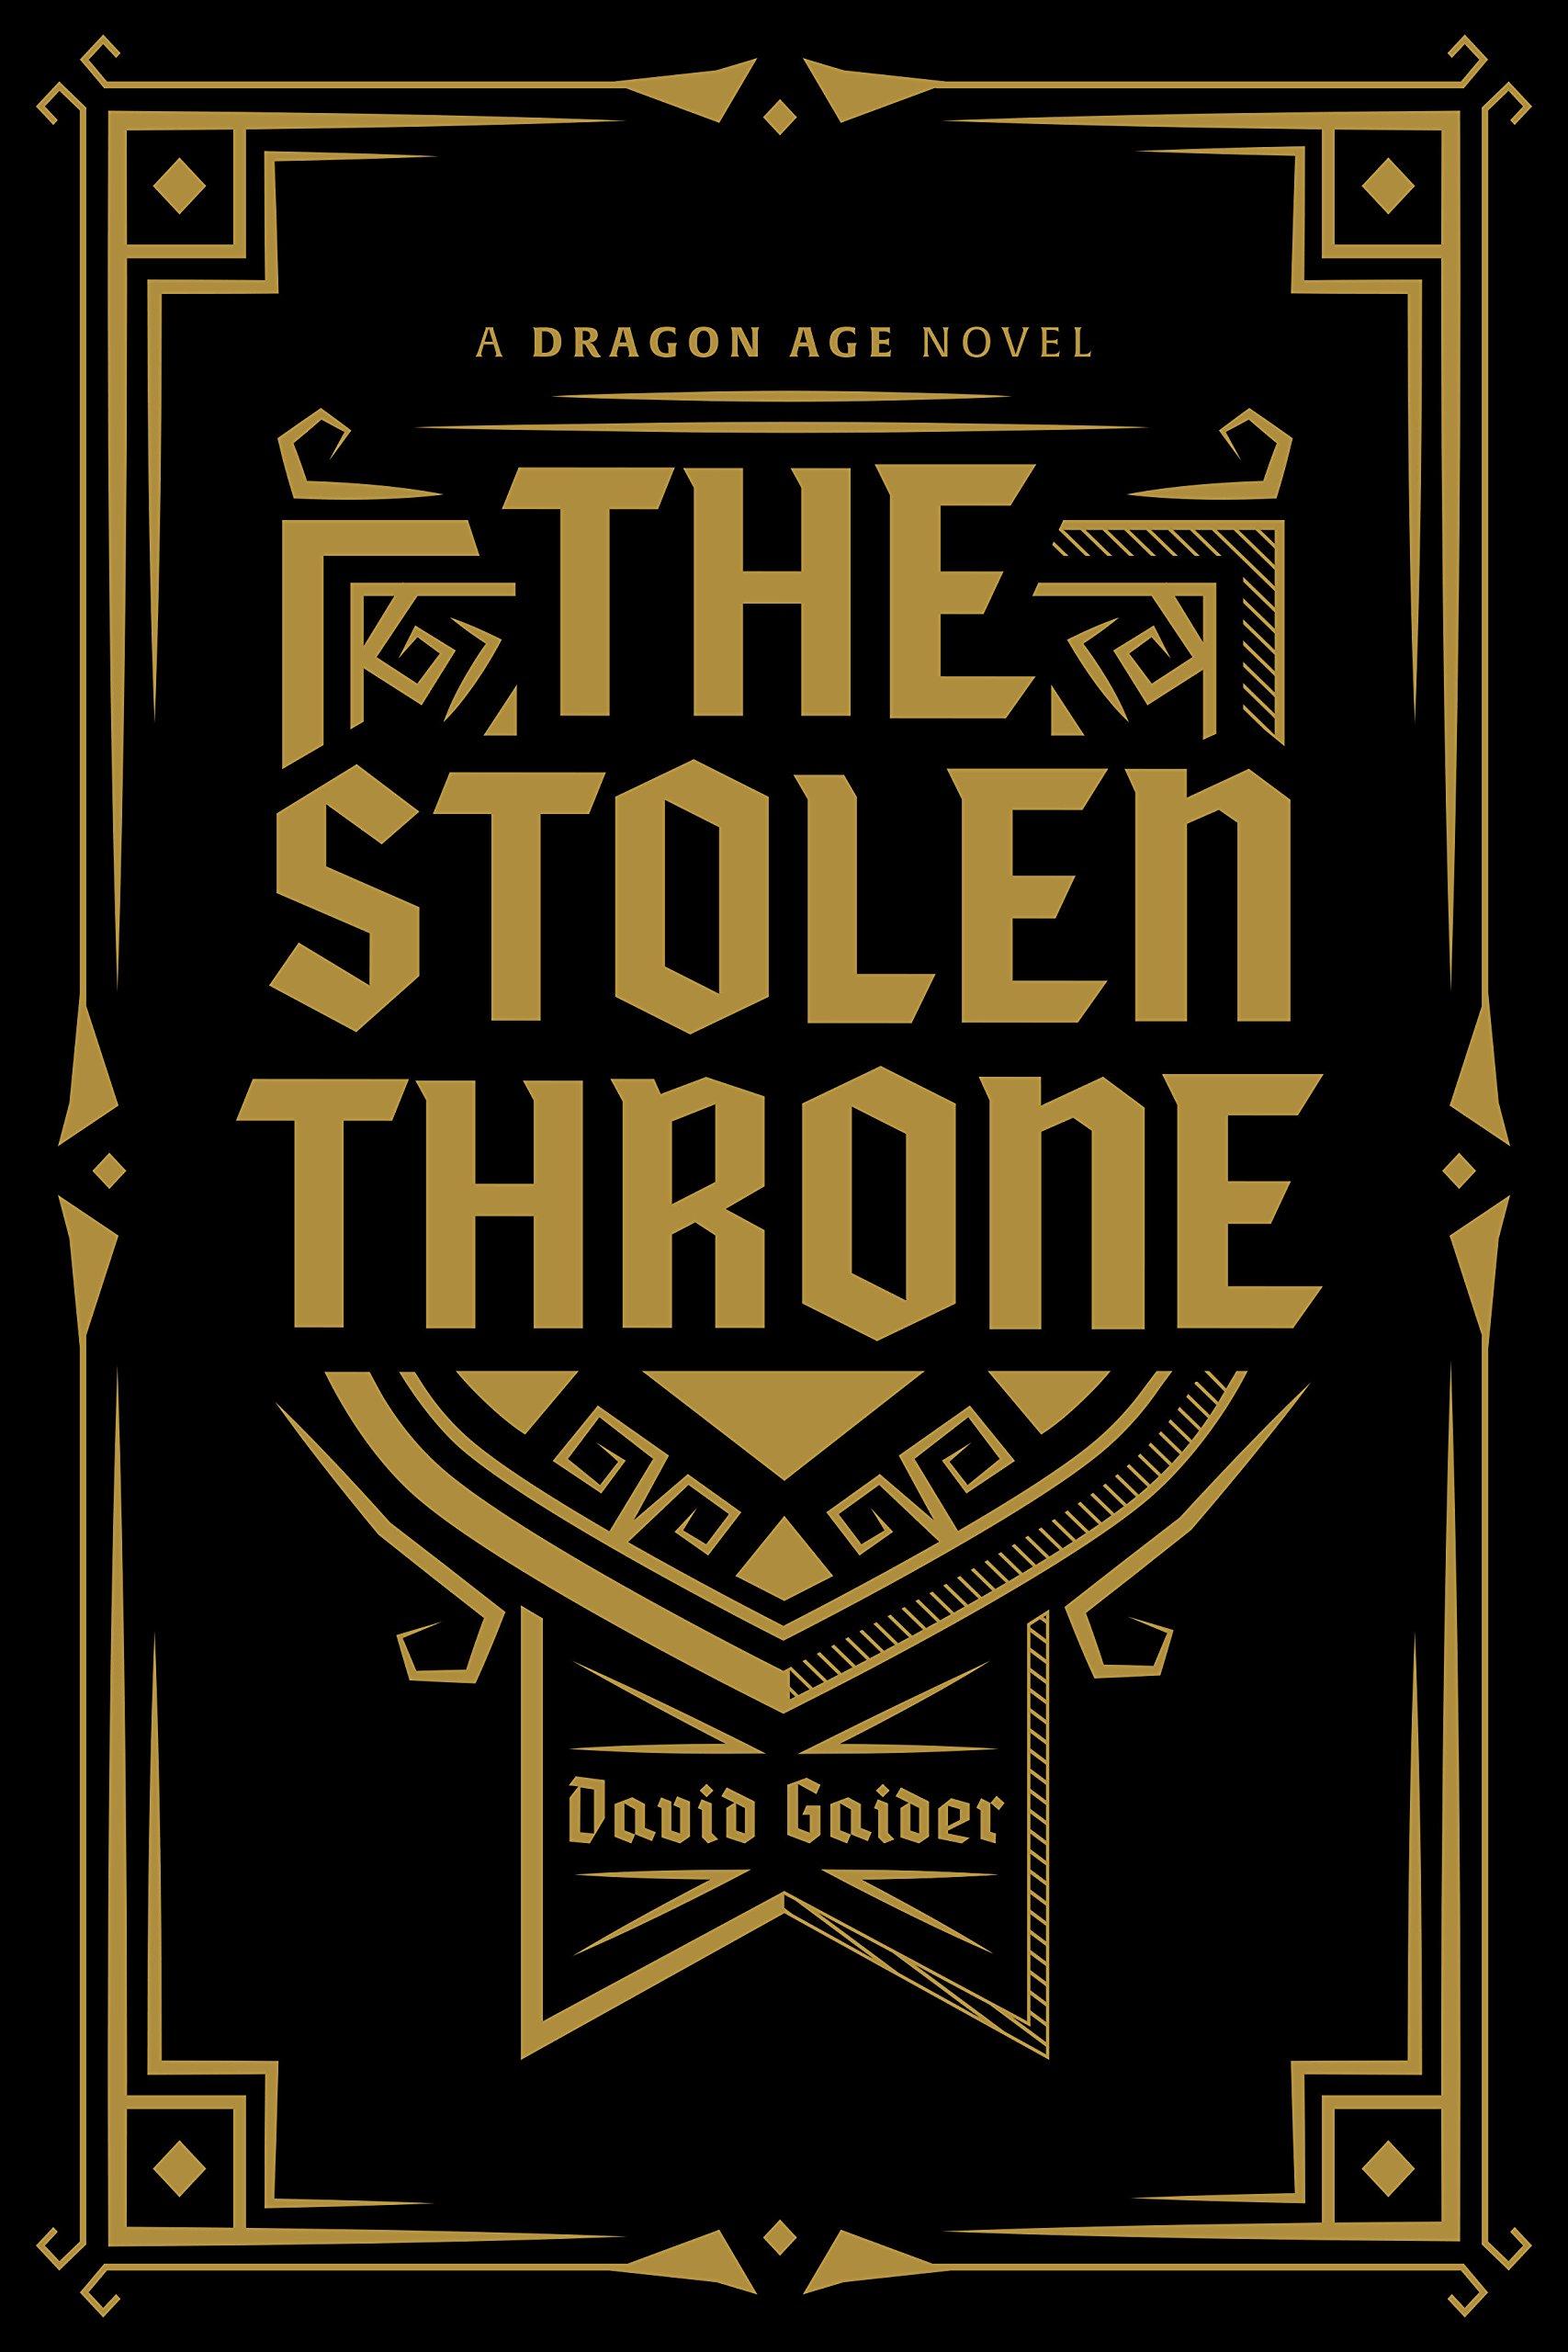 Amazon.com: Dragon Age: The Stolen Throne Deluxe Edition ...